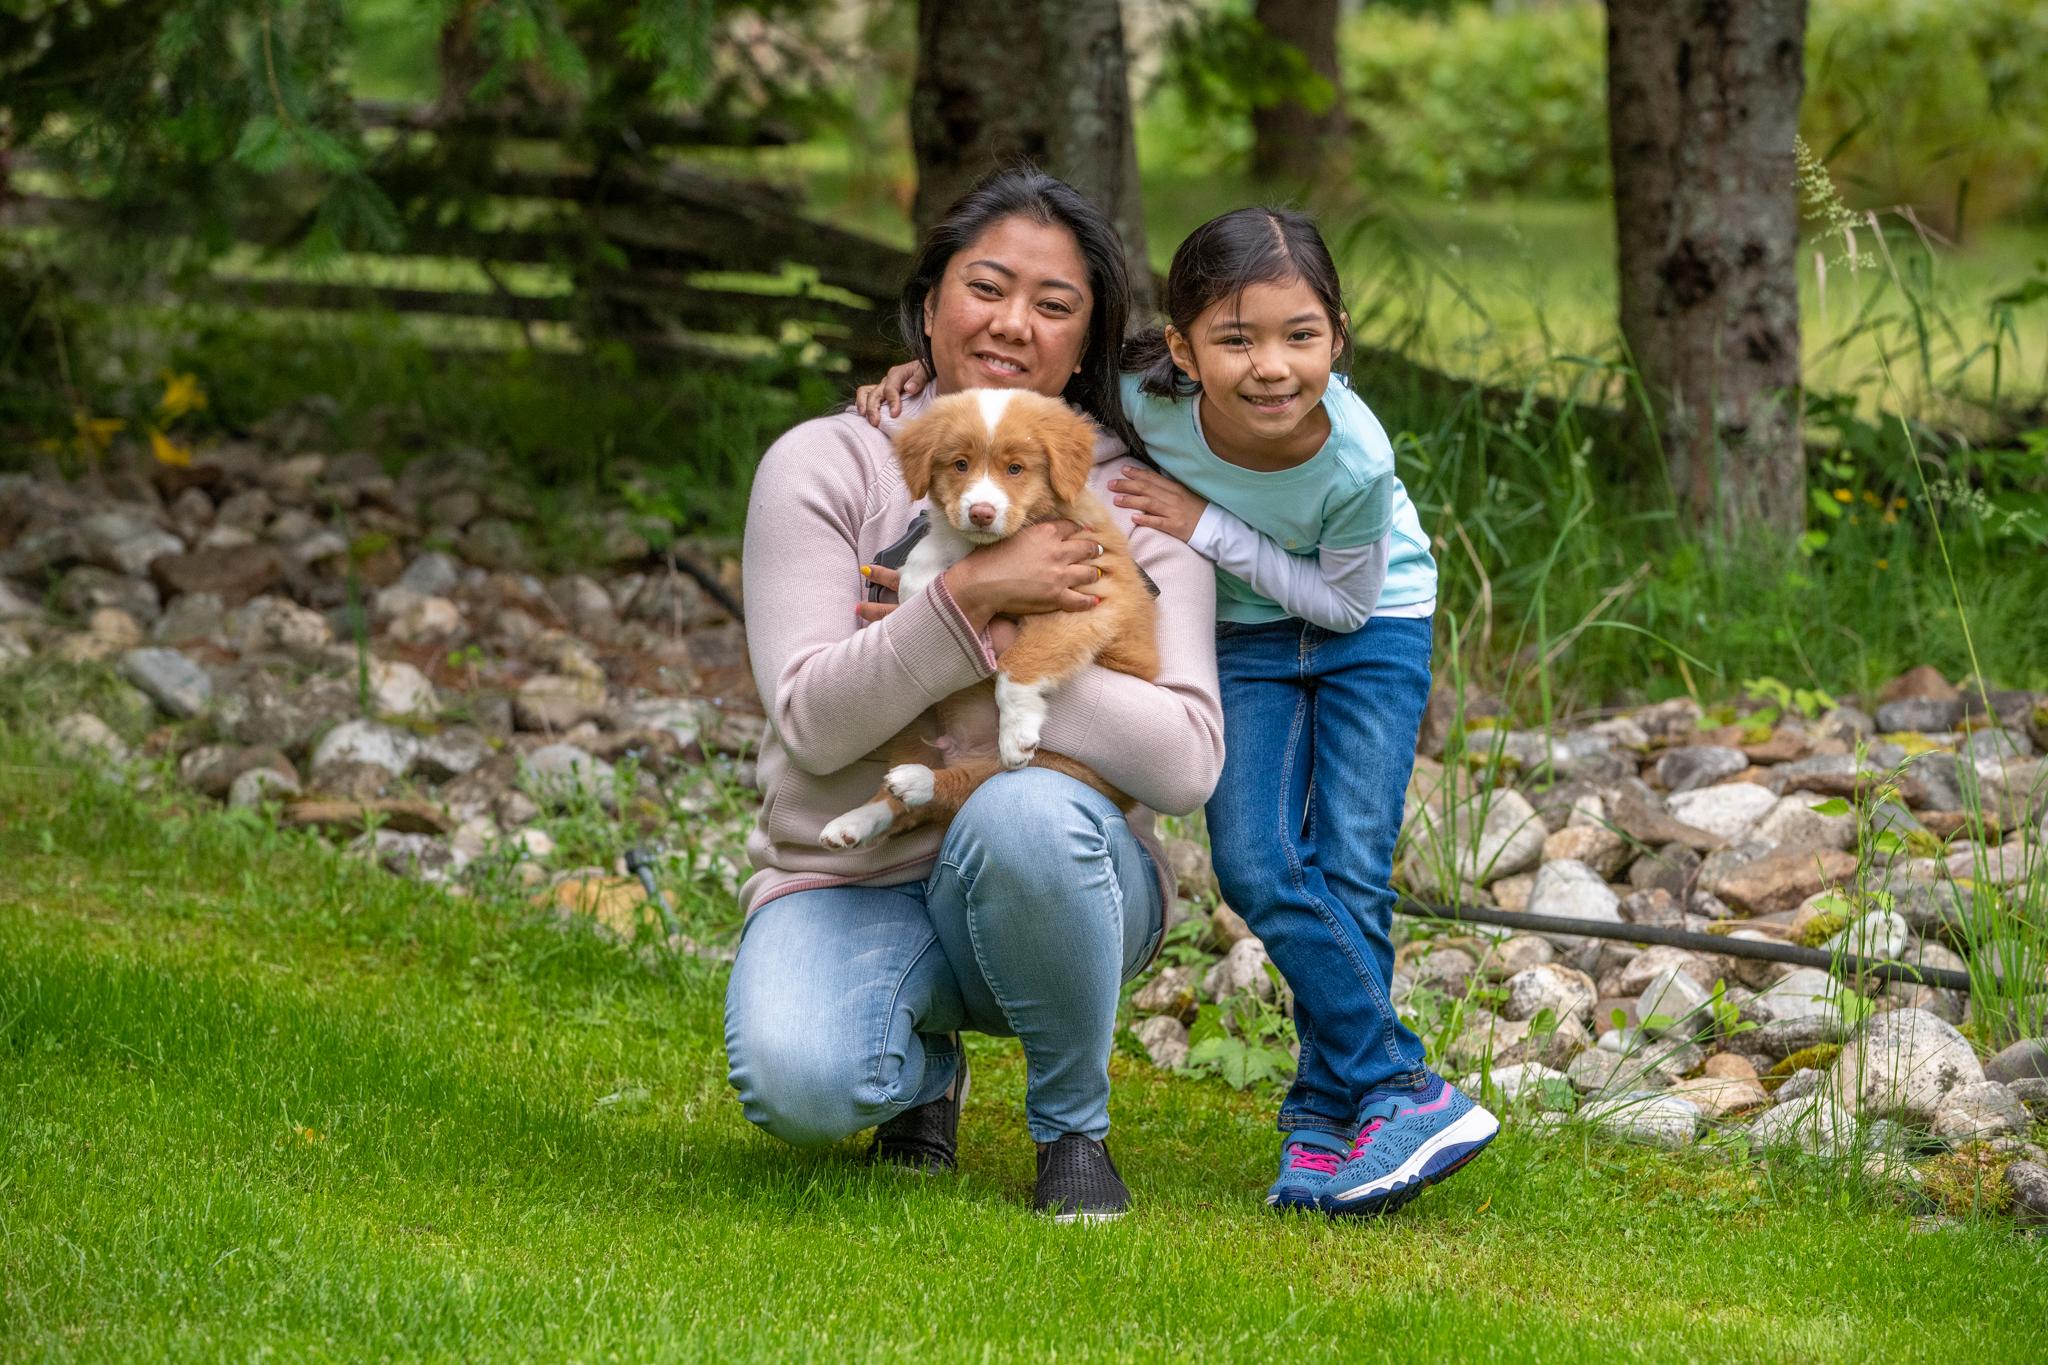 Susan, Mia and puppy Wilbur. Photo: Tasha Hall, BC Farm and Family Photography.